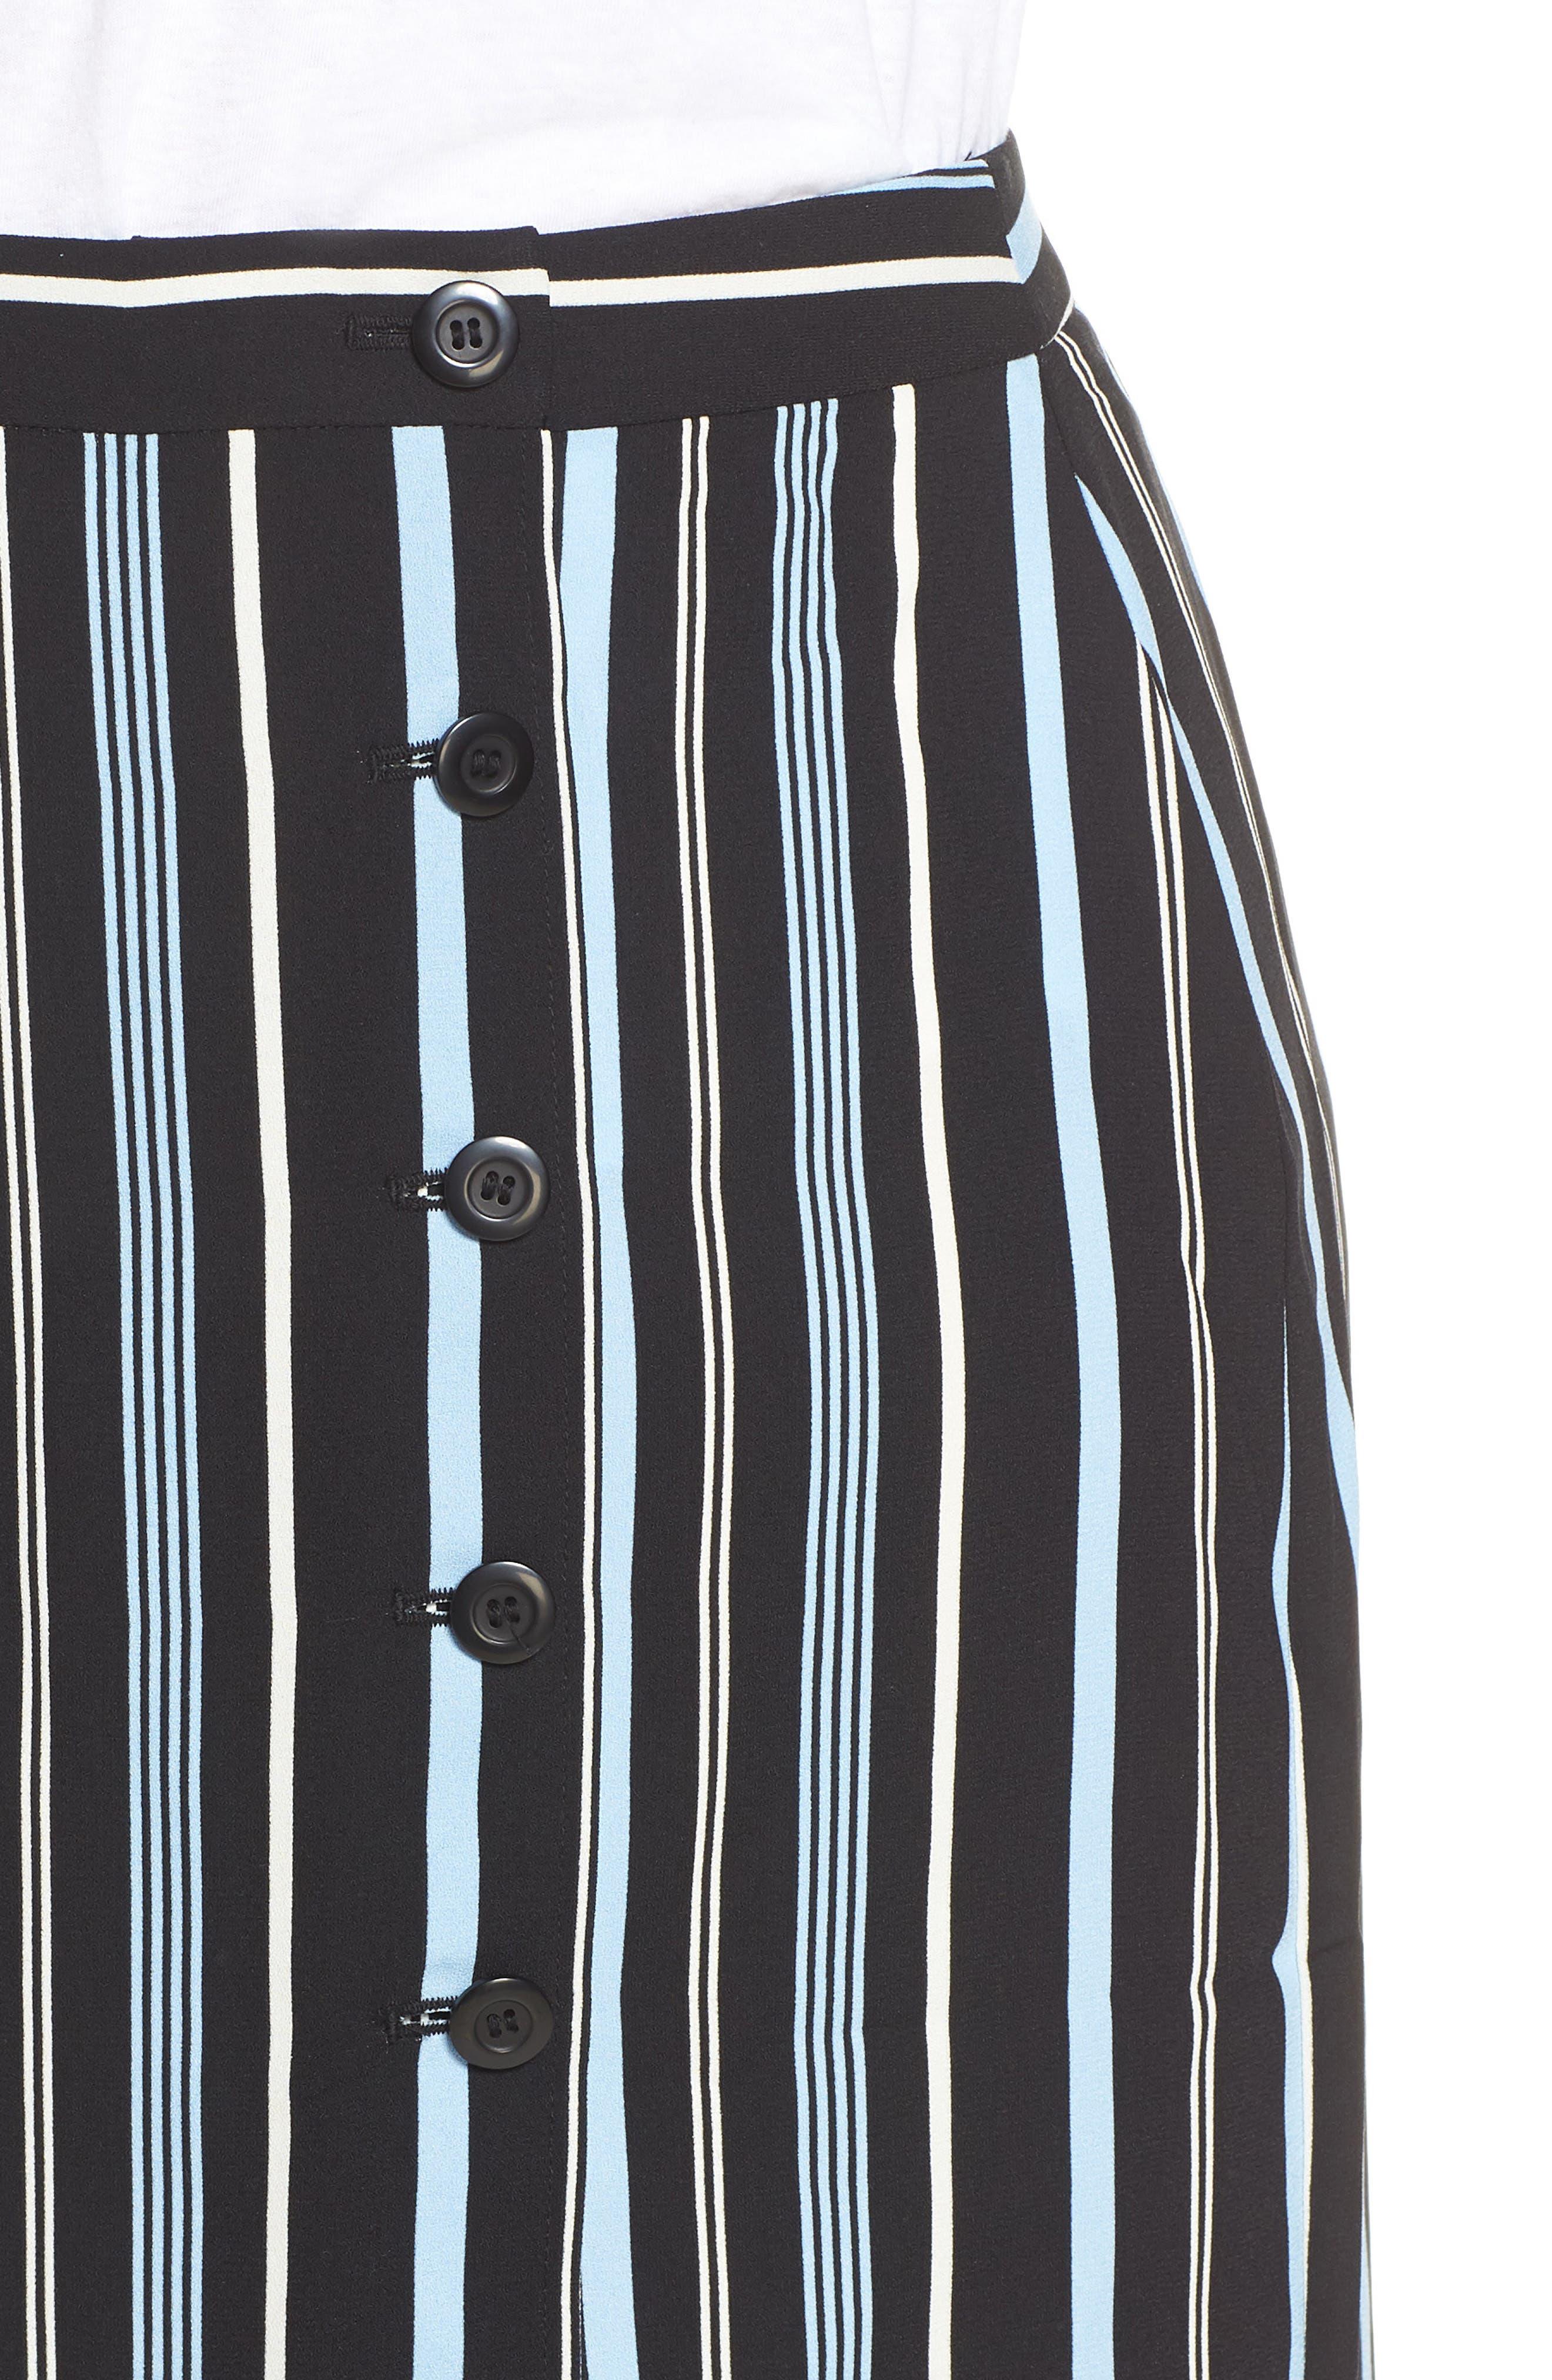 Button Wrap Skirt,                             Alternate thumbnail 10, color,                             BLACK MULTI COLORED STRIPE